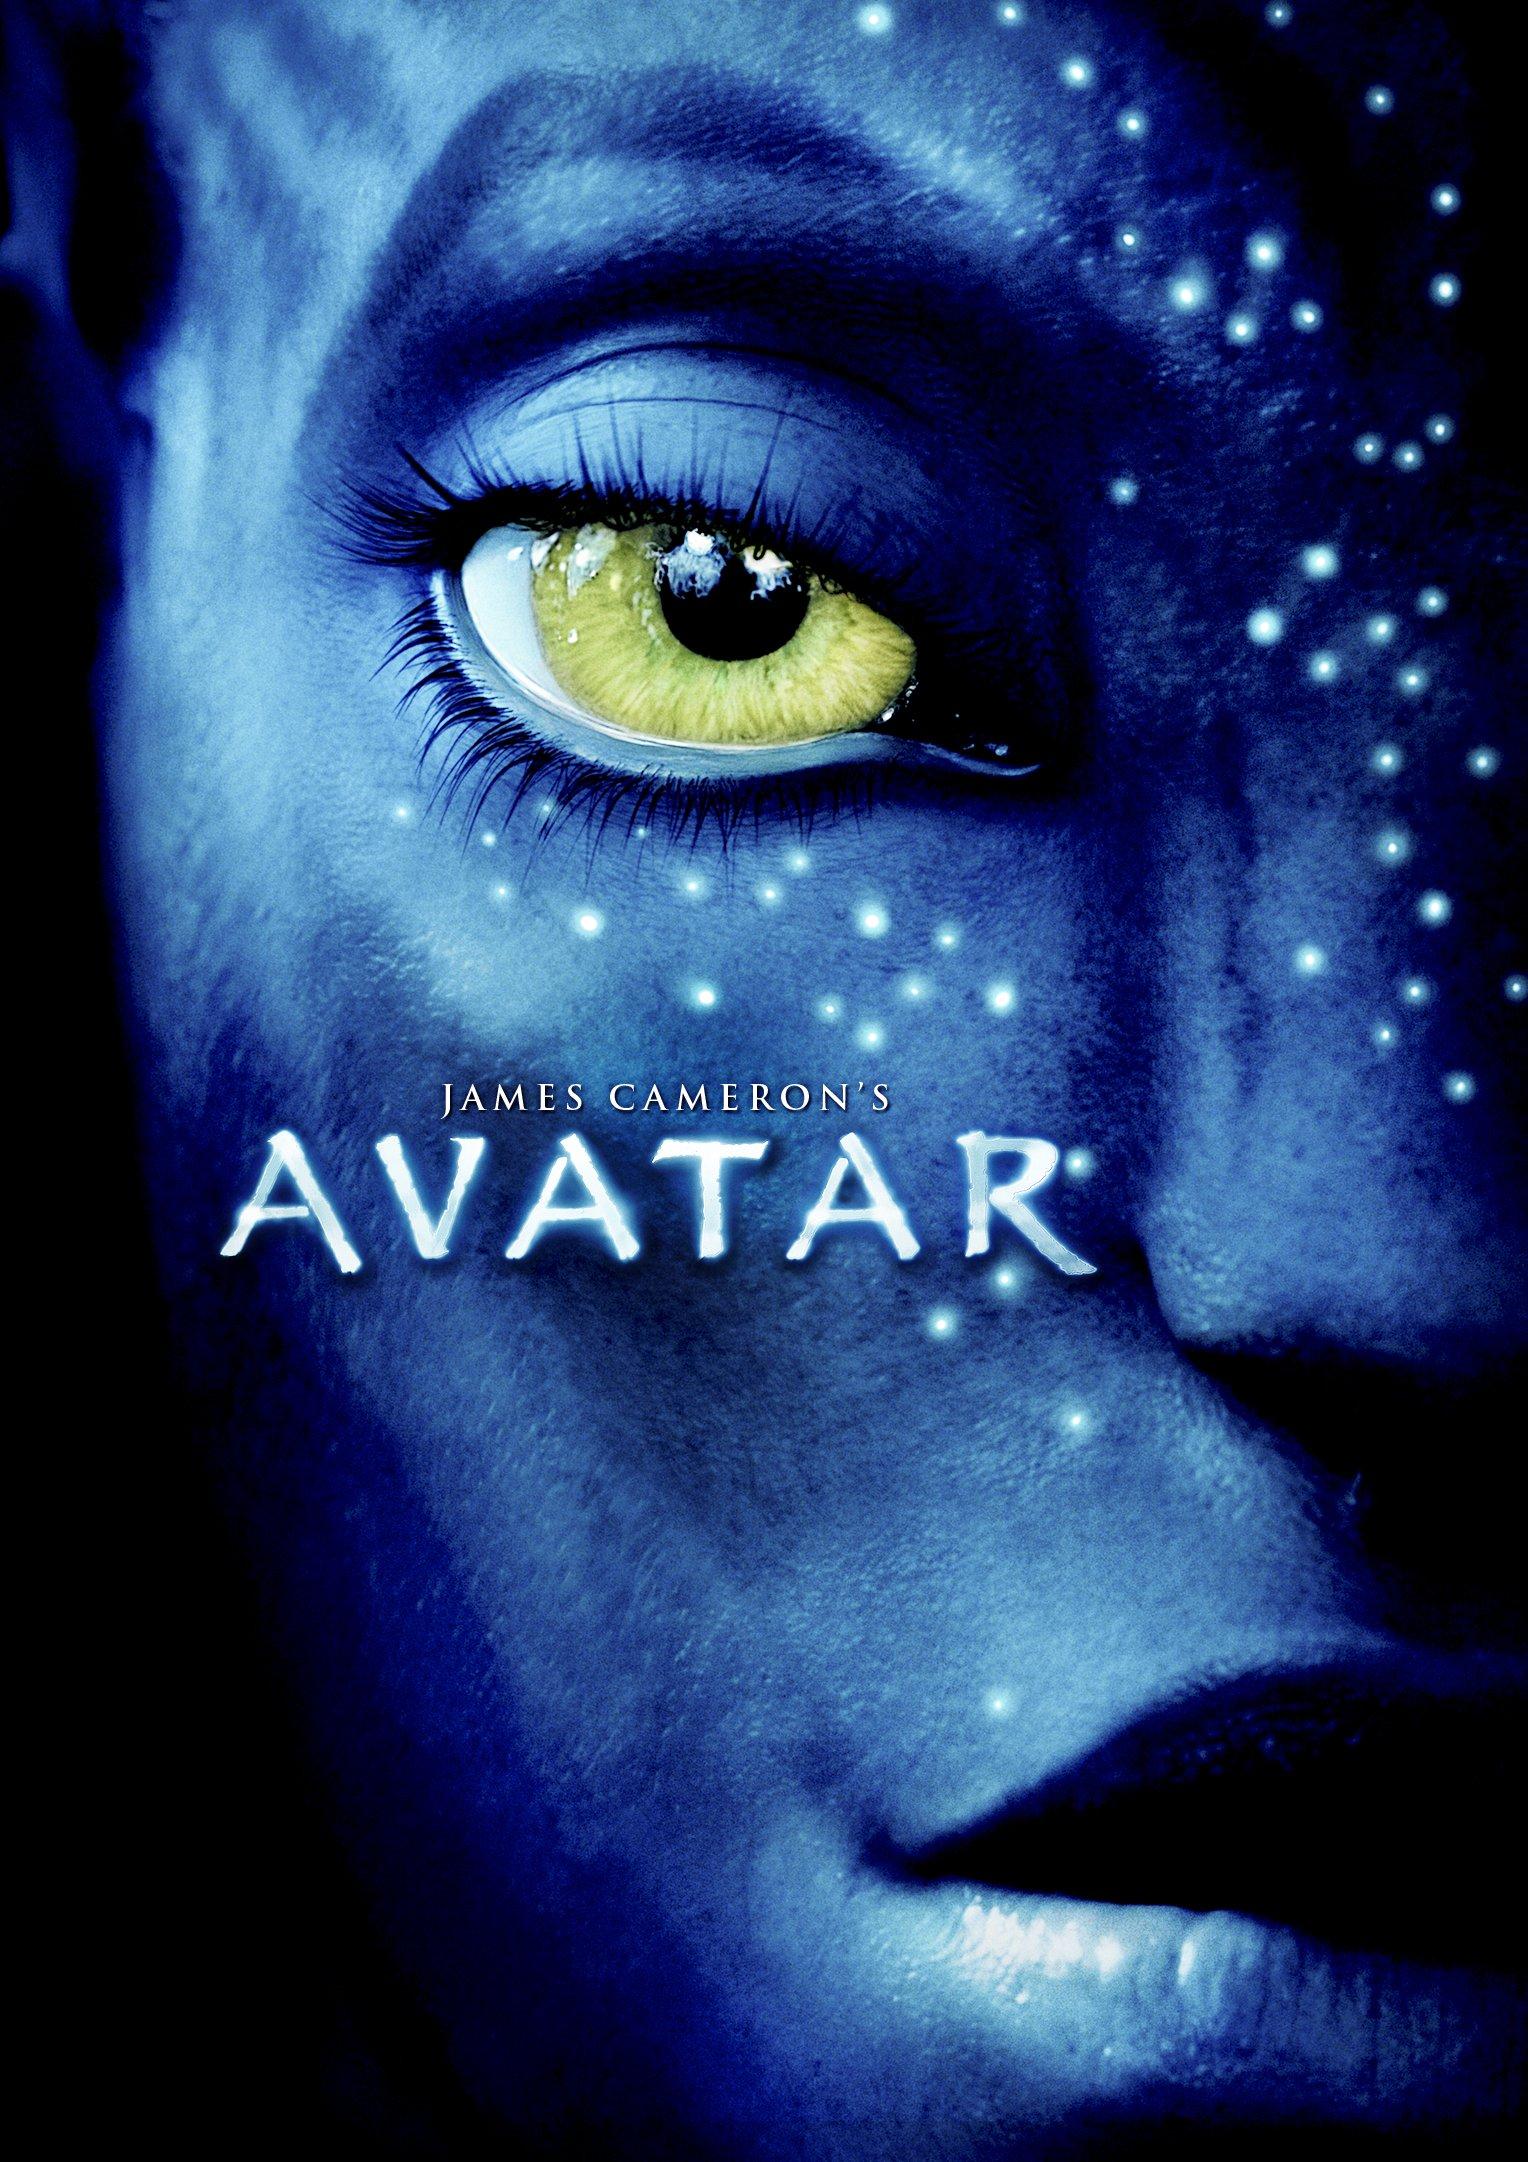 avatar special edition full movie online